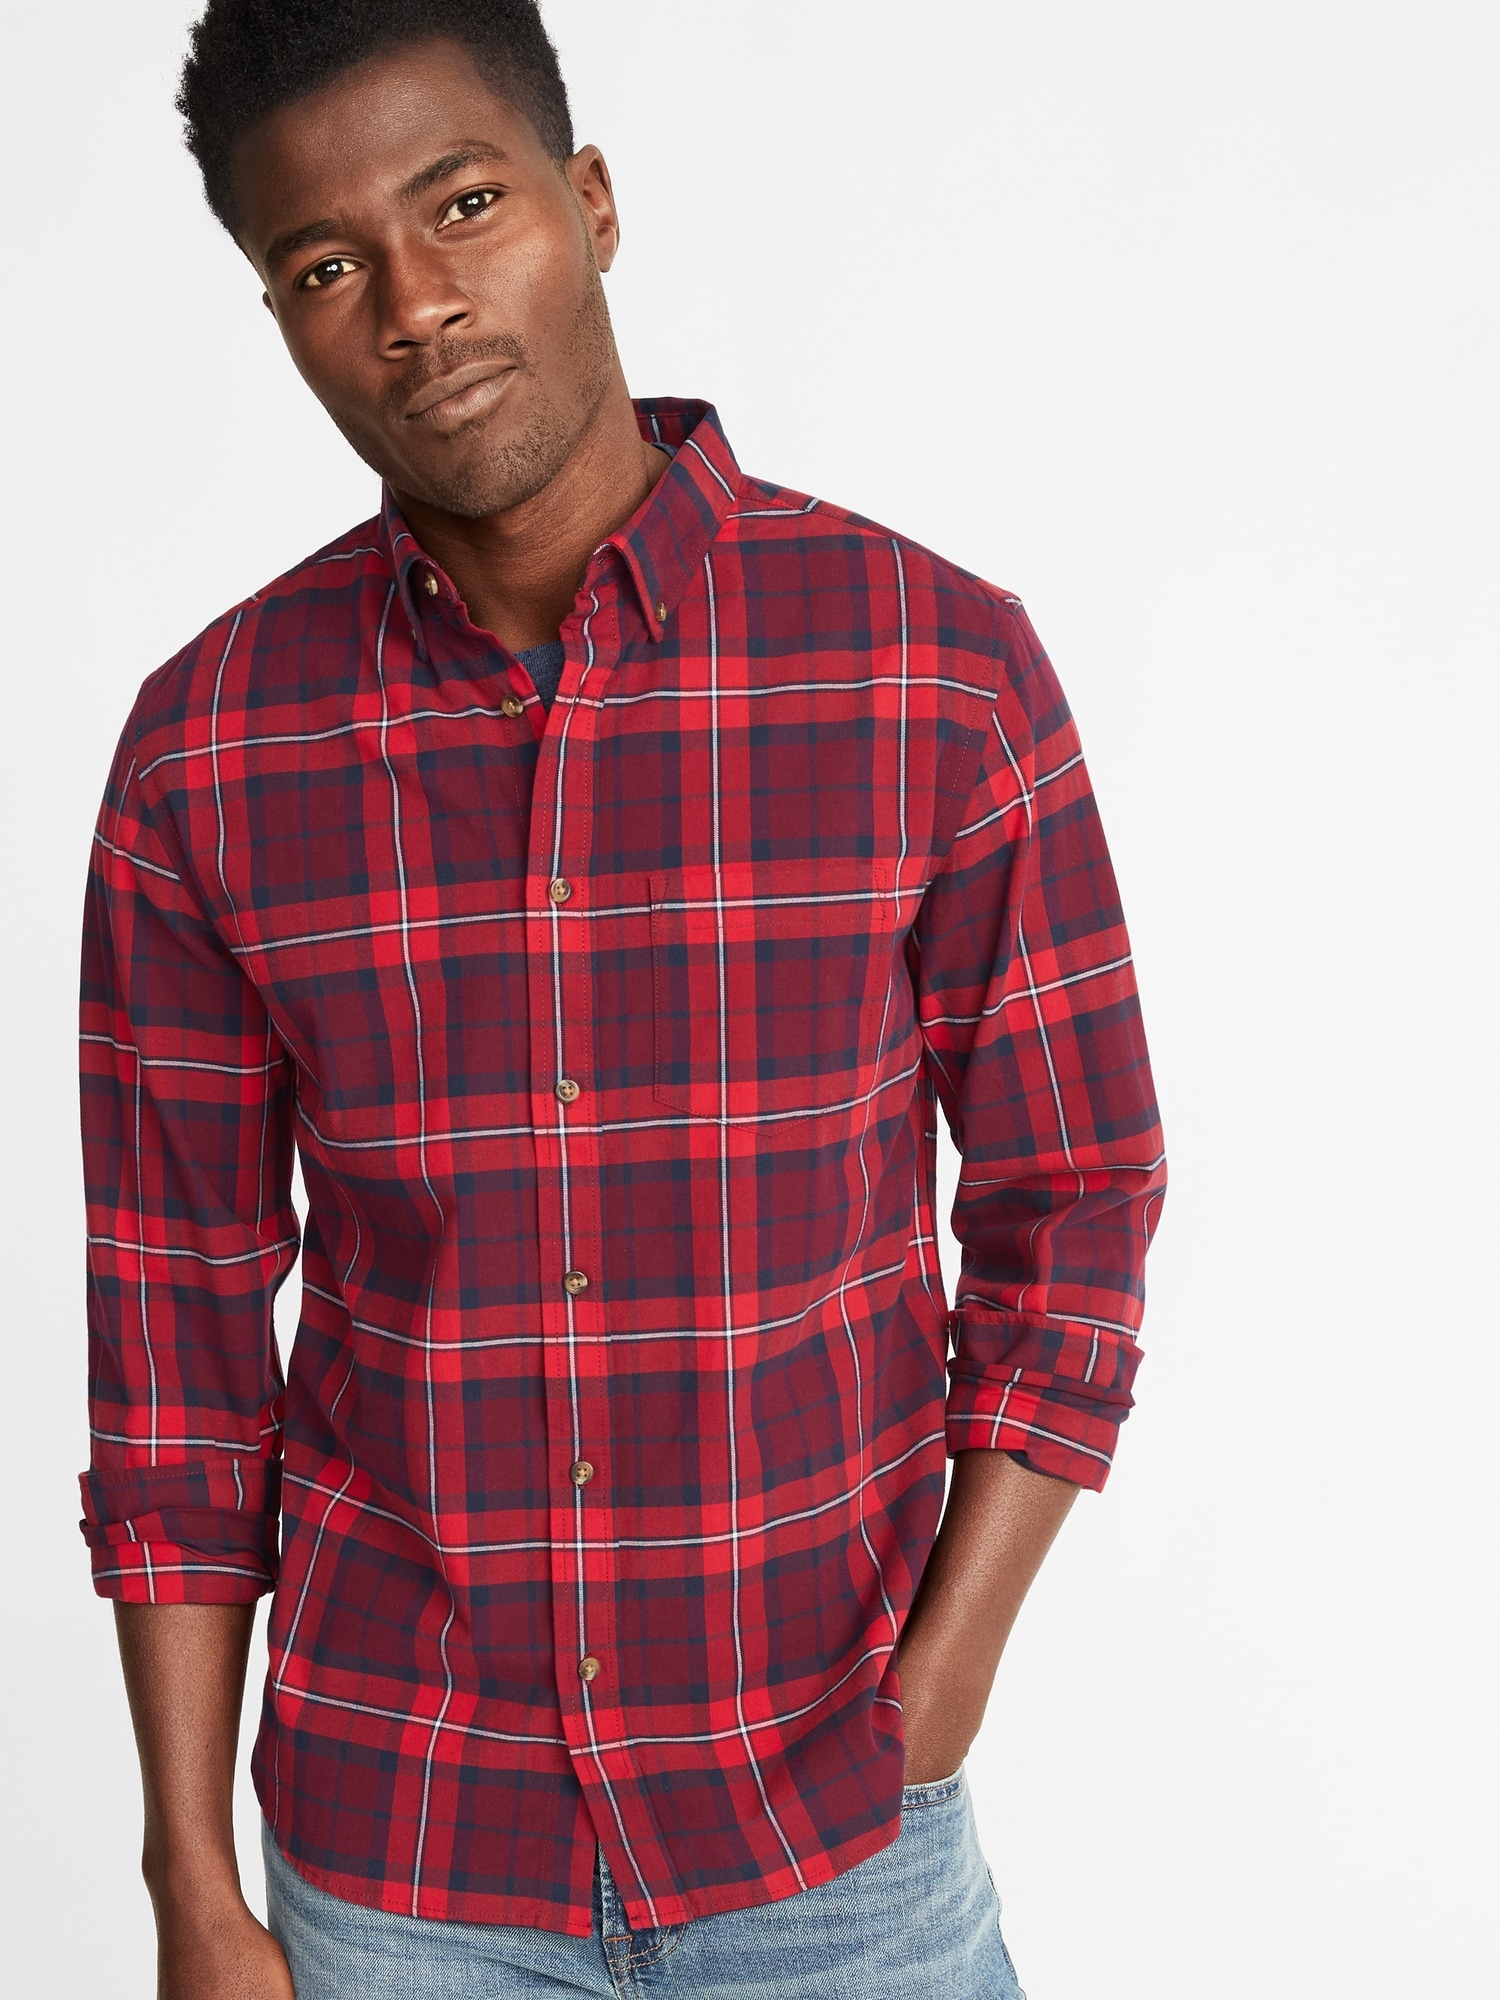 9664760ab39c4 Slim-Fit Built-In Flex Everyday Oxford Shirt For Men